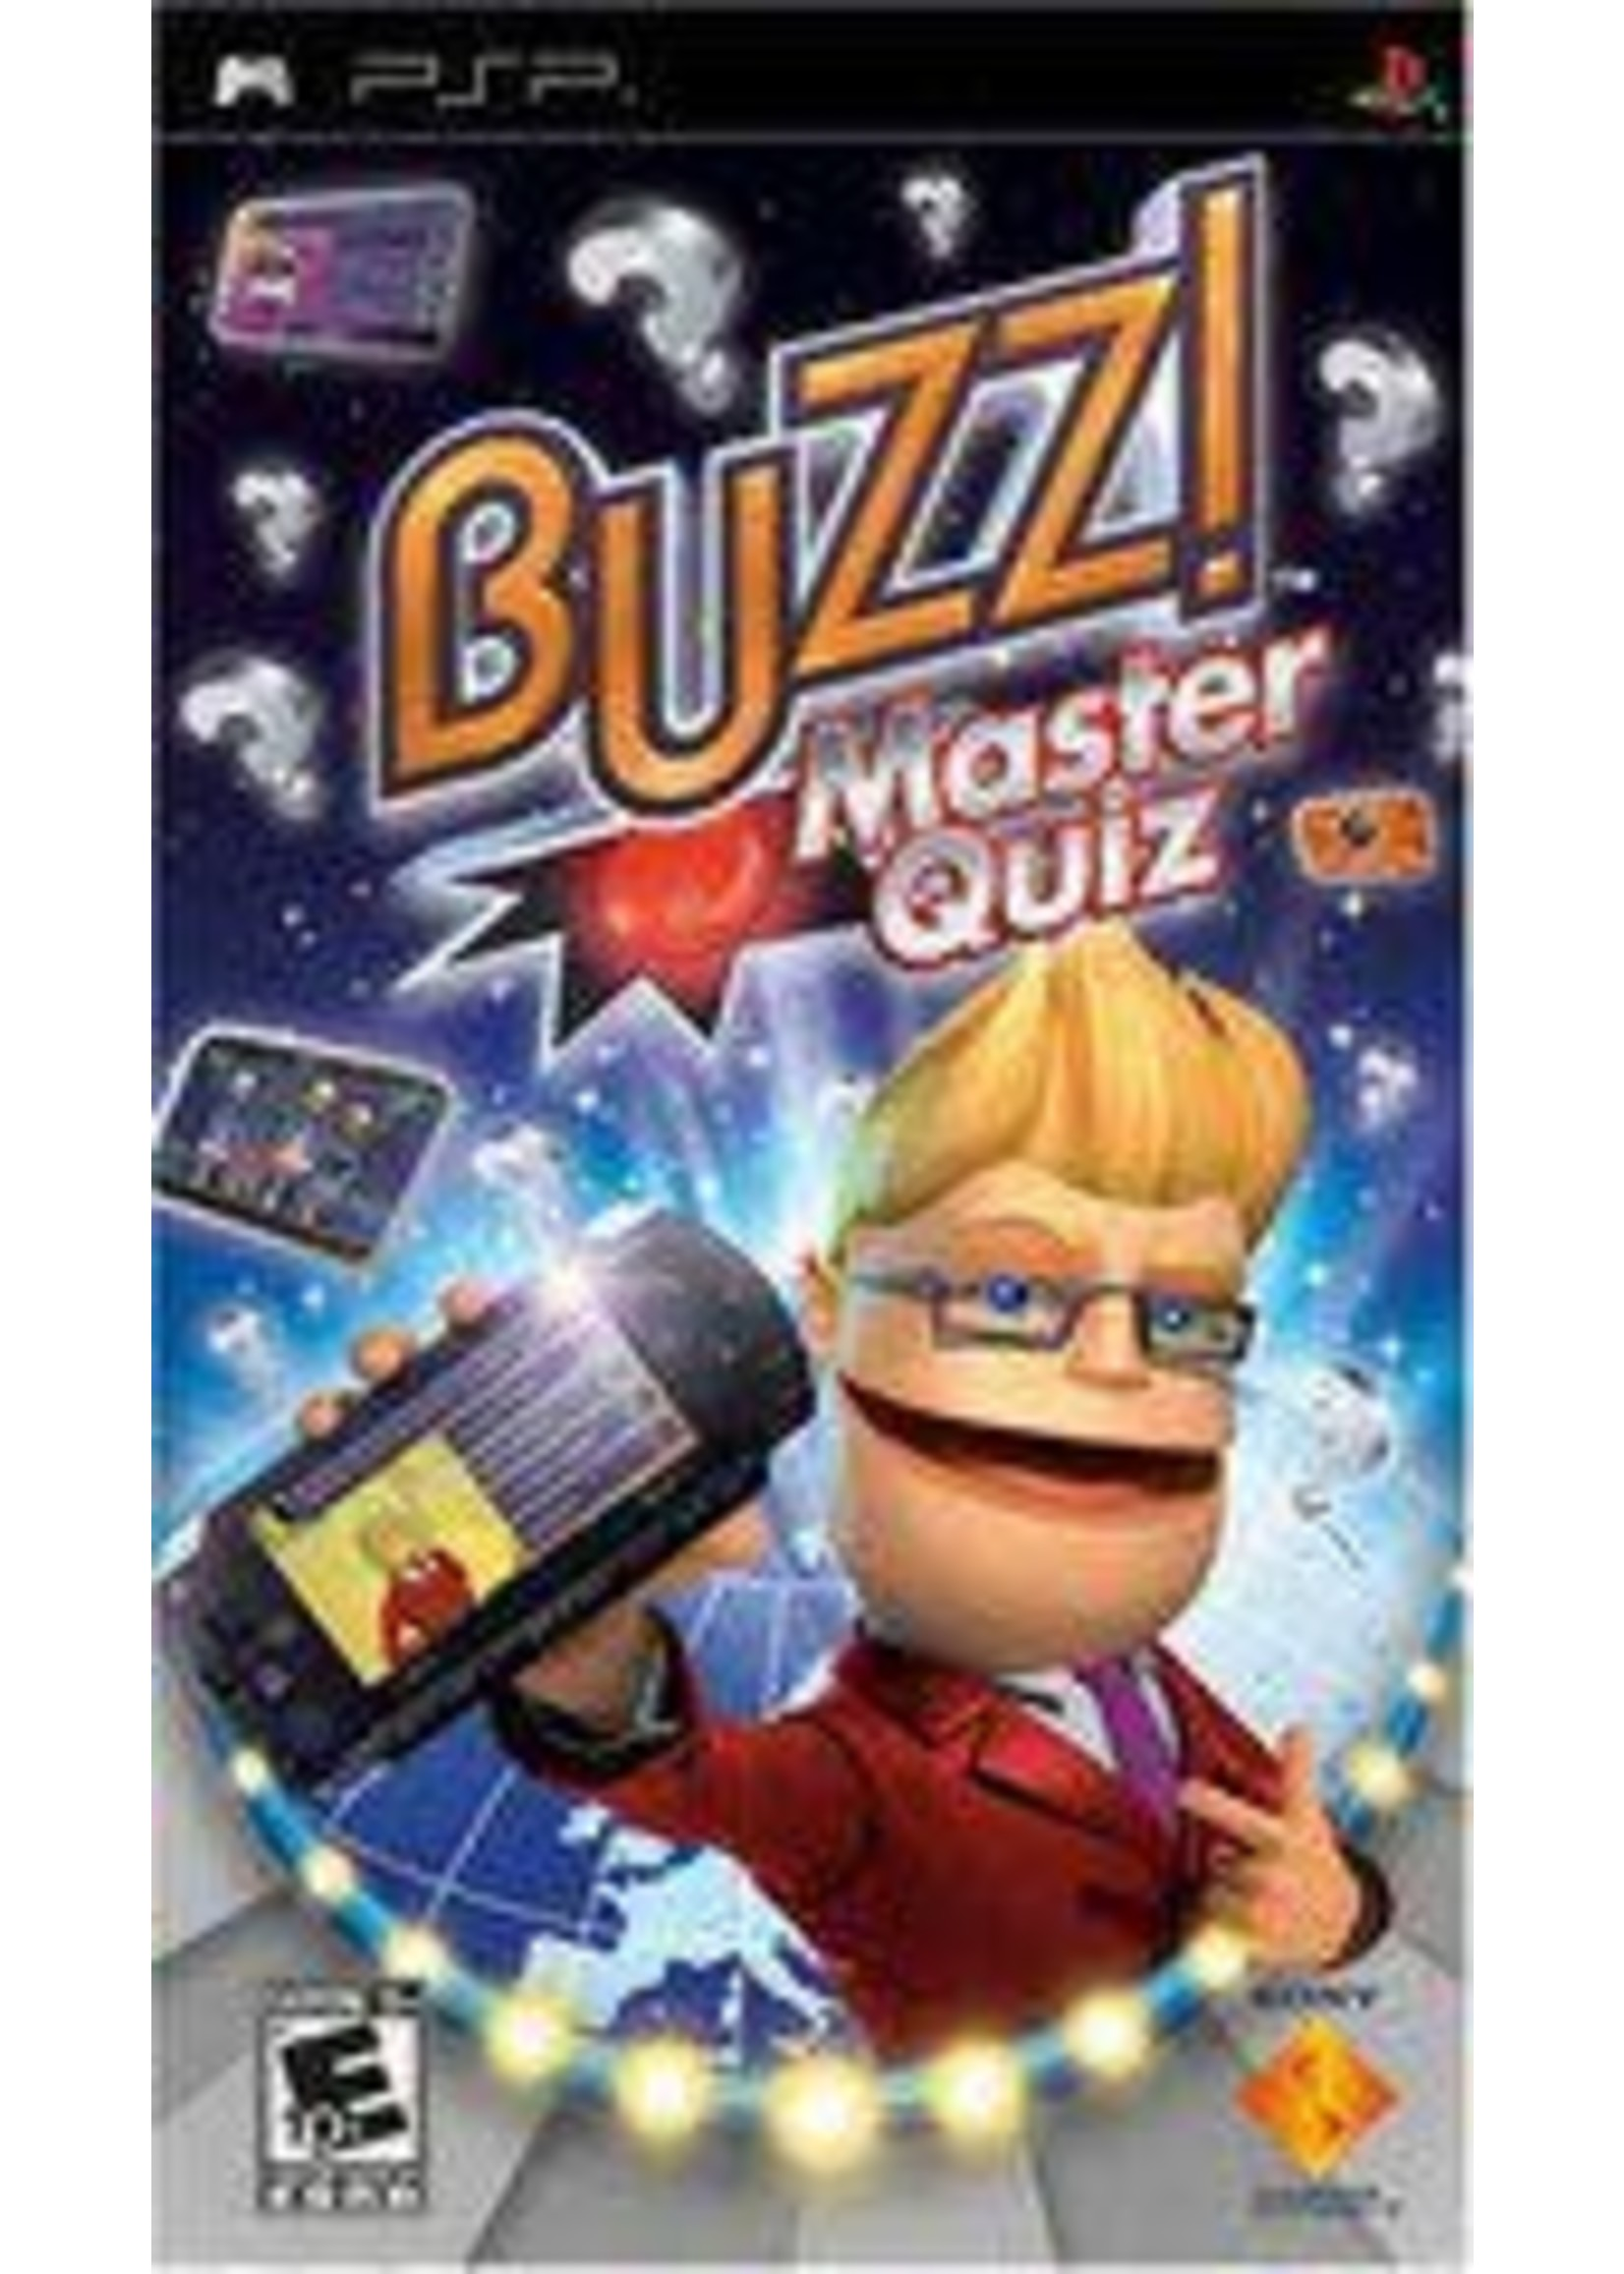 Buzz! Master Quiz PSP